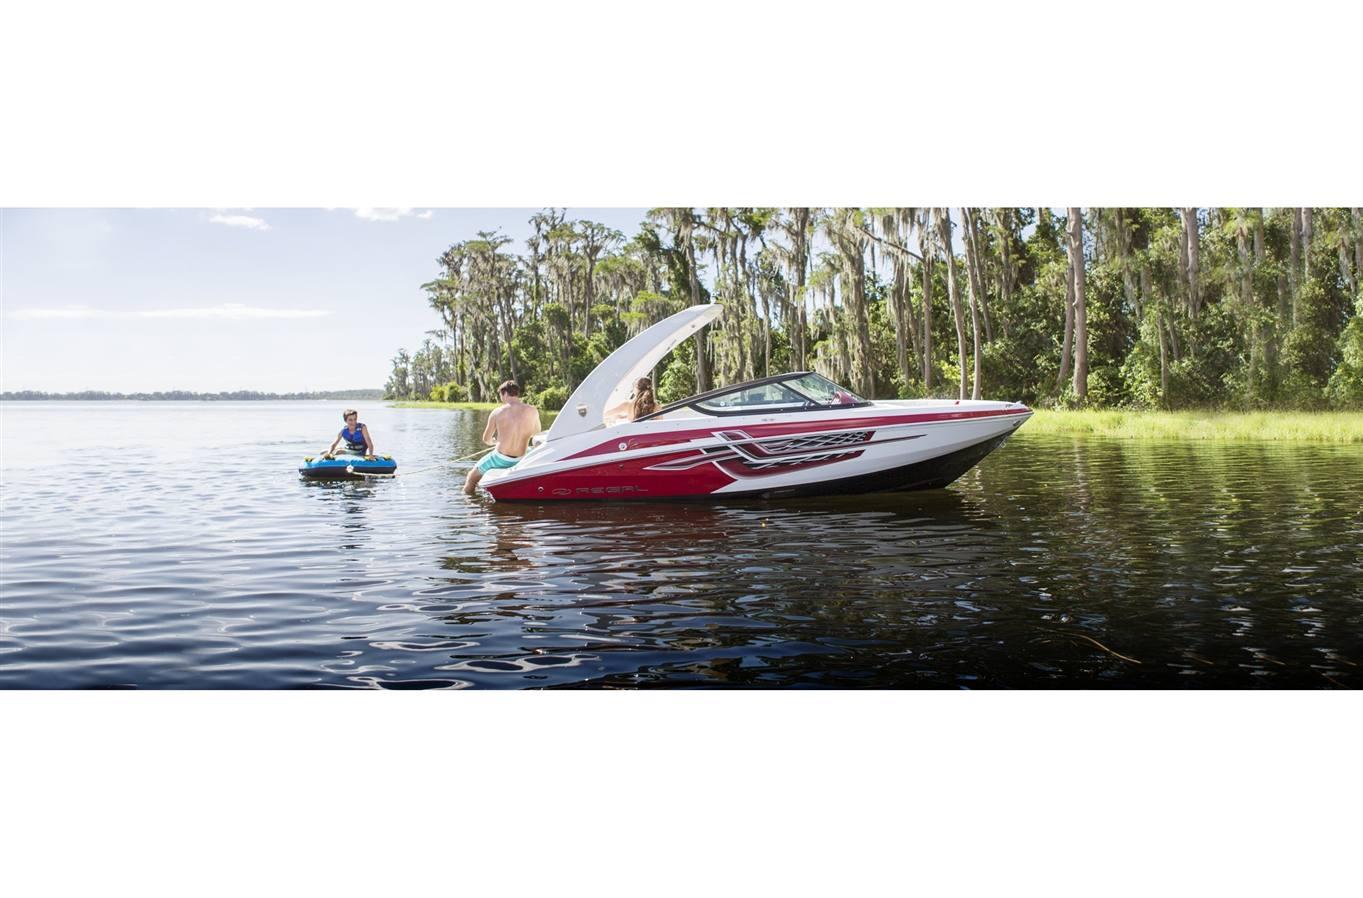 2017 regal 2000 esx for sale | legendary marine - destin (850) 203-4074